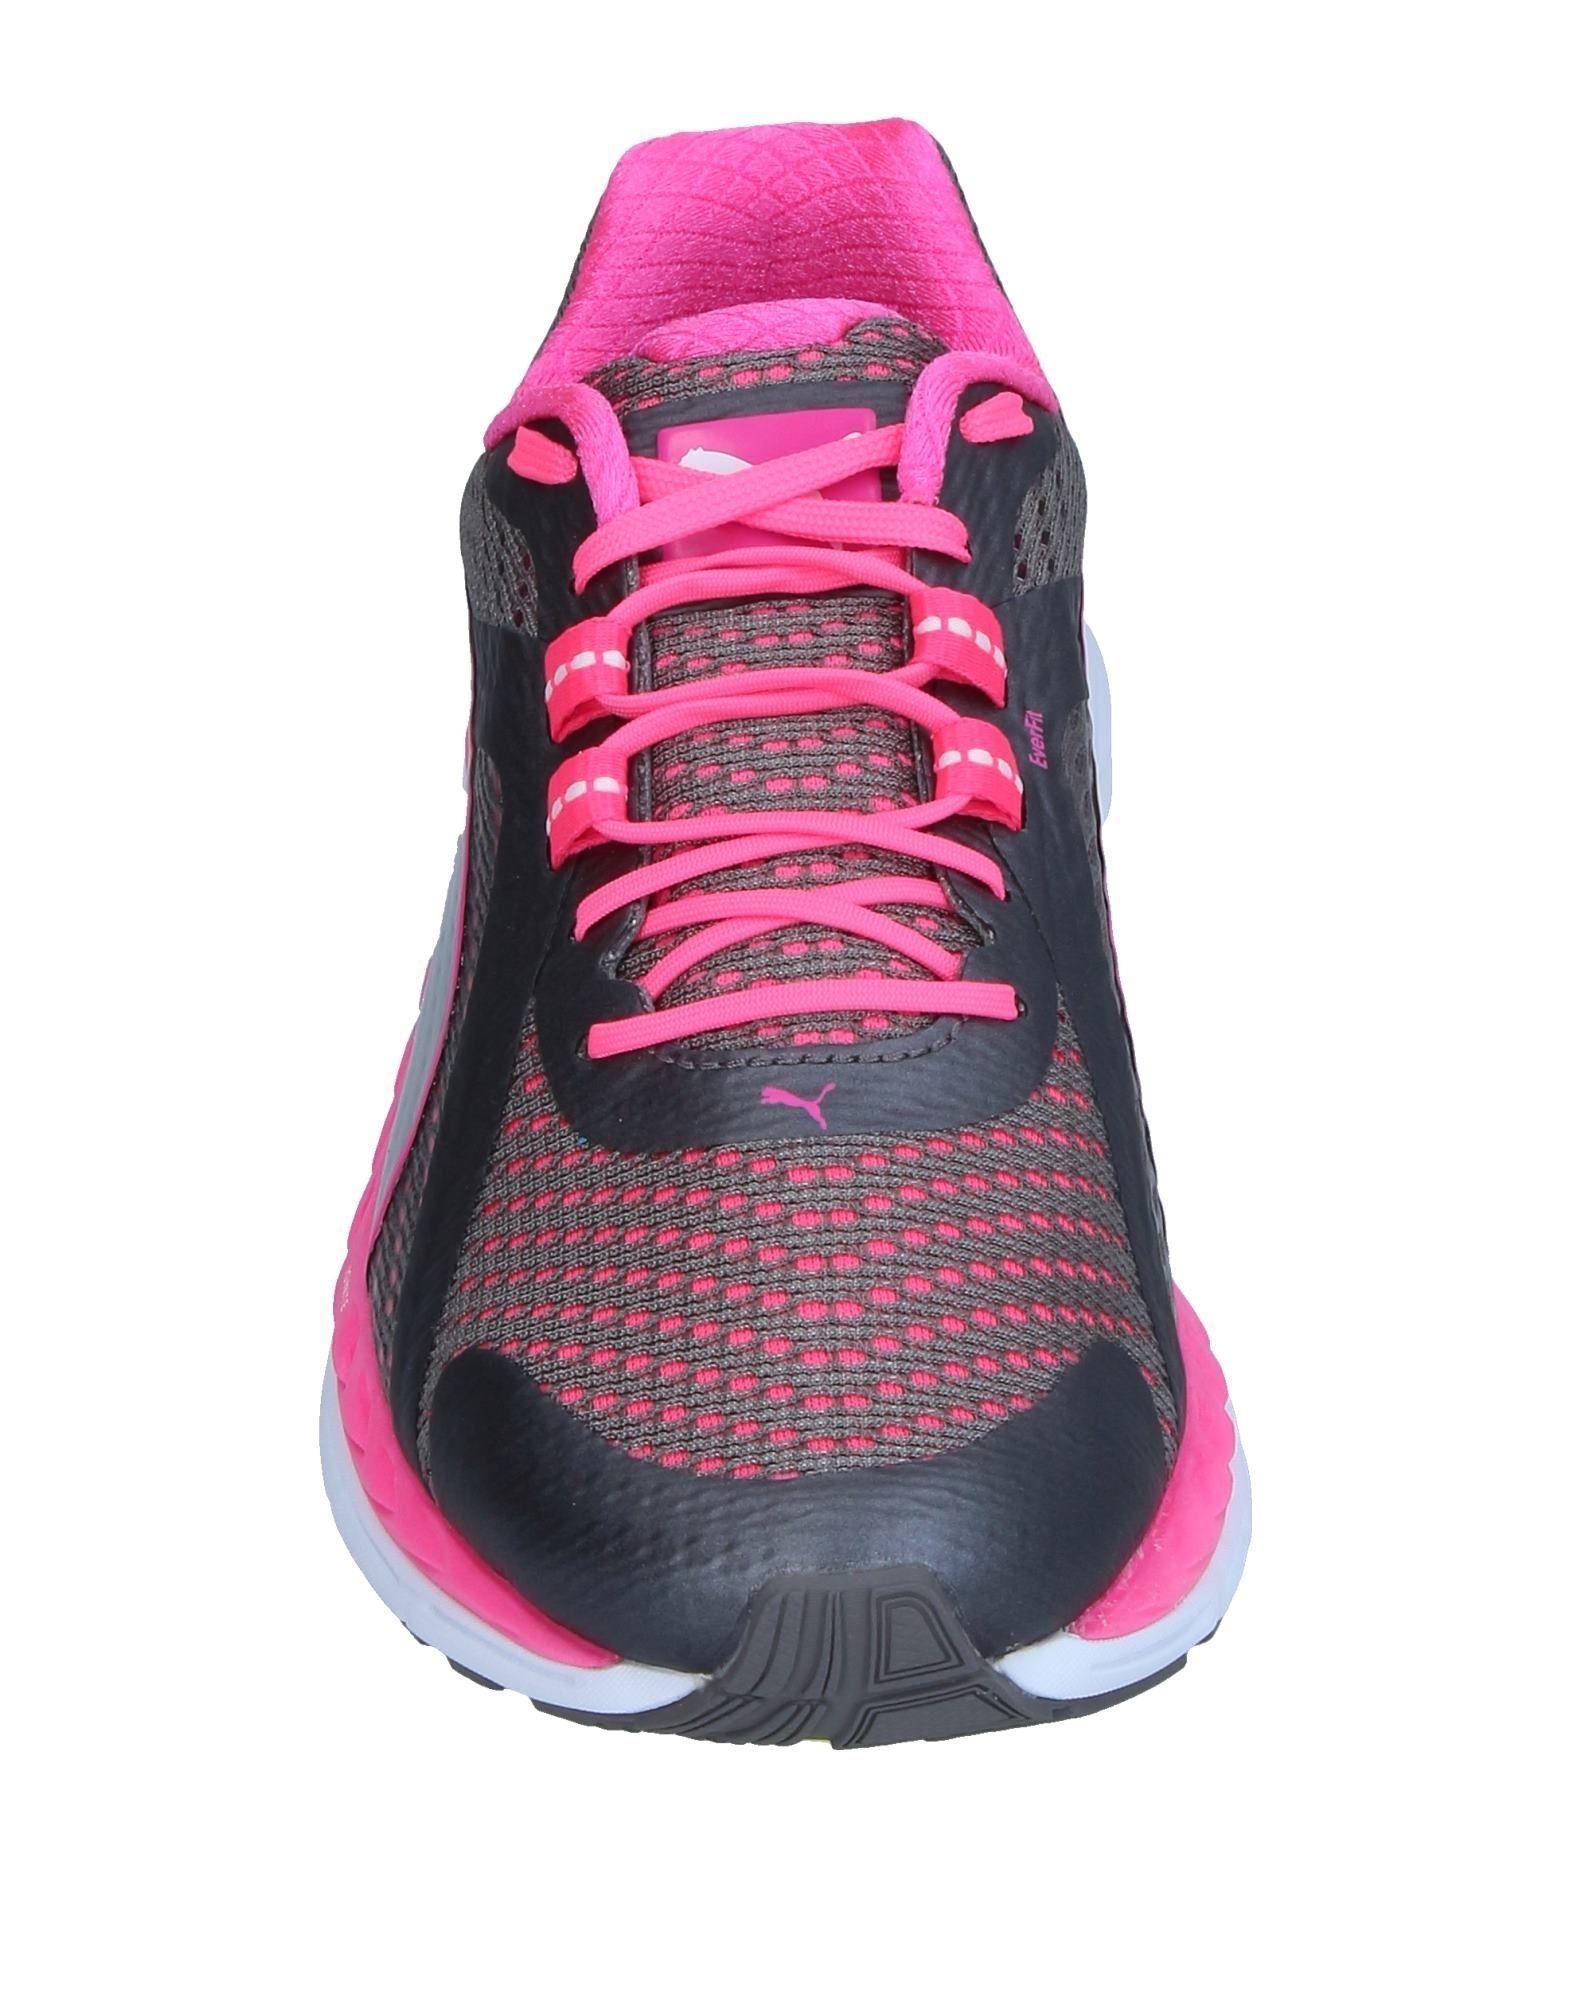 Sneakers Puma Femme - Sneakers Puma sur